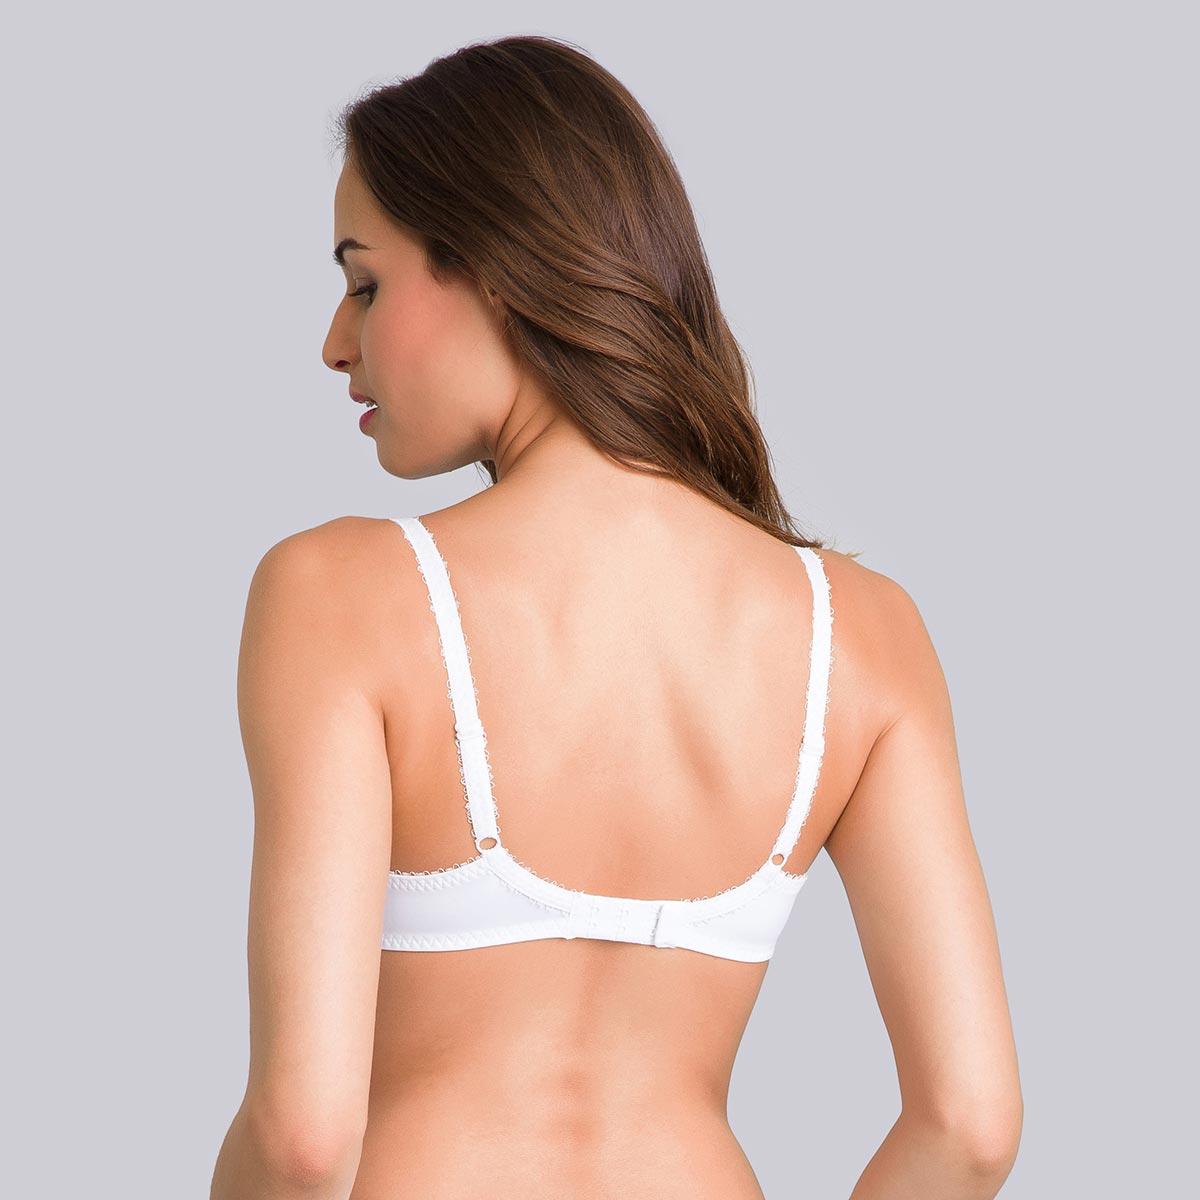 Pack of 2 black and white bras– Flower Elegance-PLAYTEX